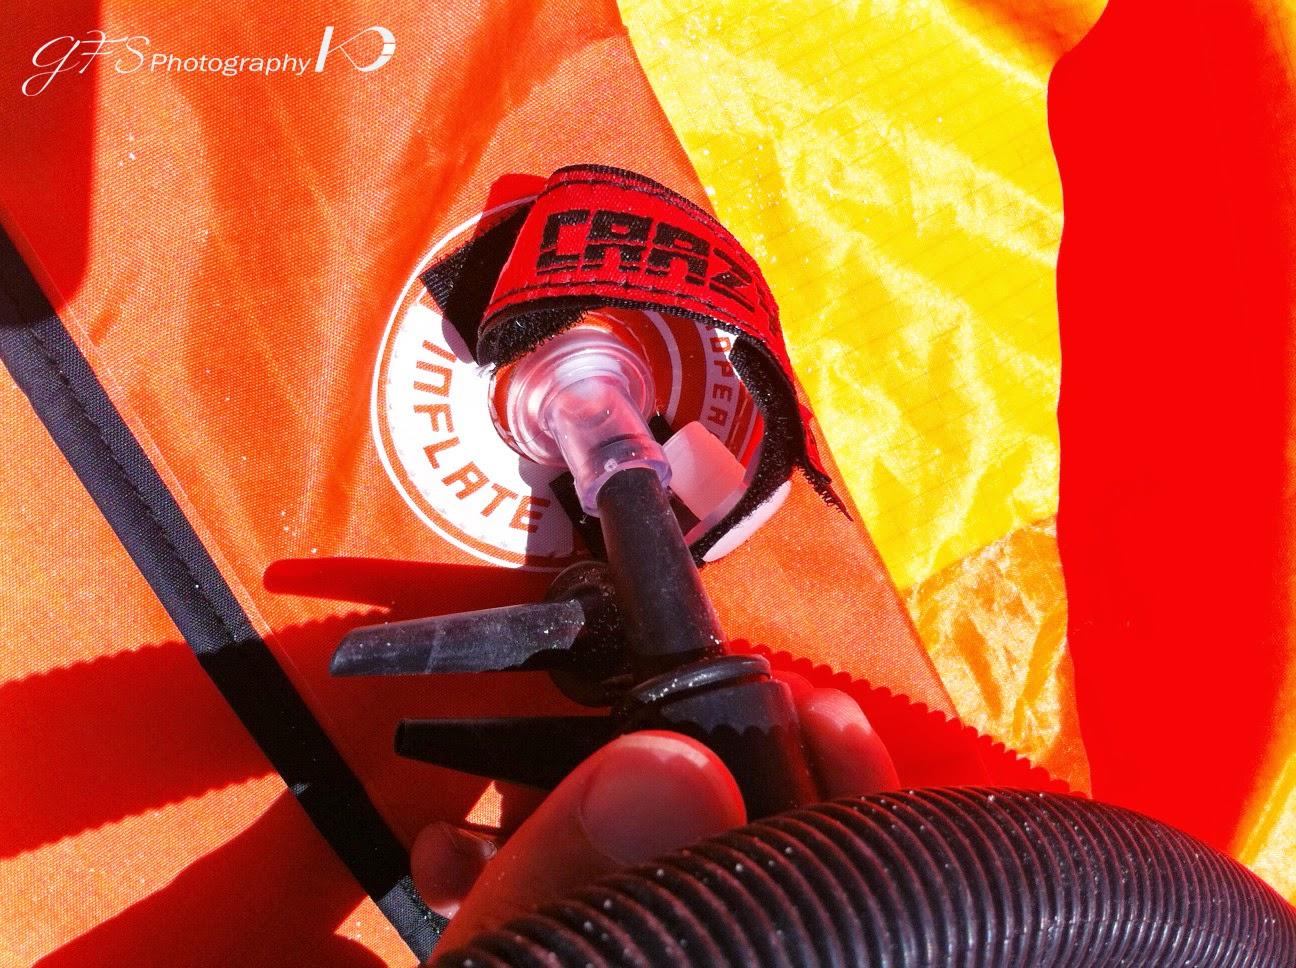 kitesurf kiteboard kite valves nozzle